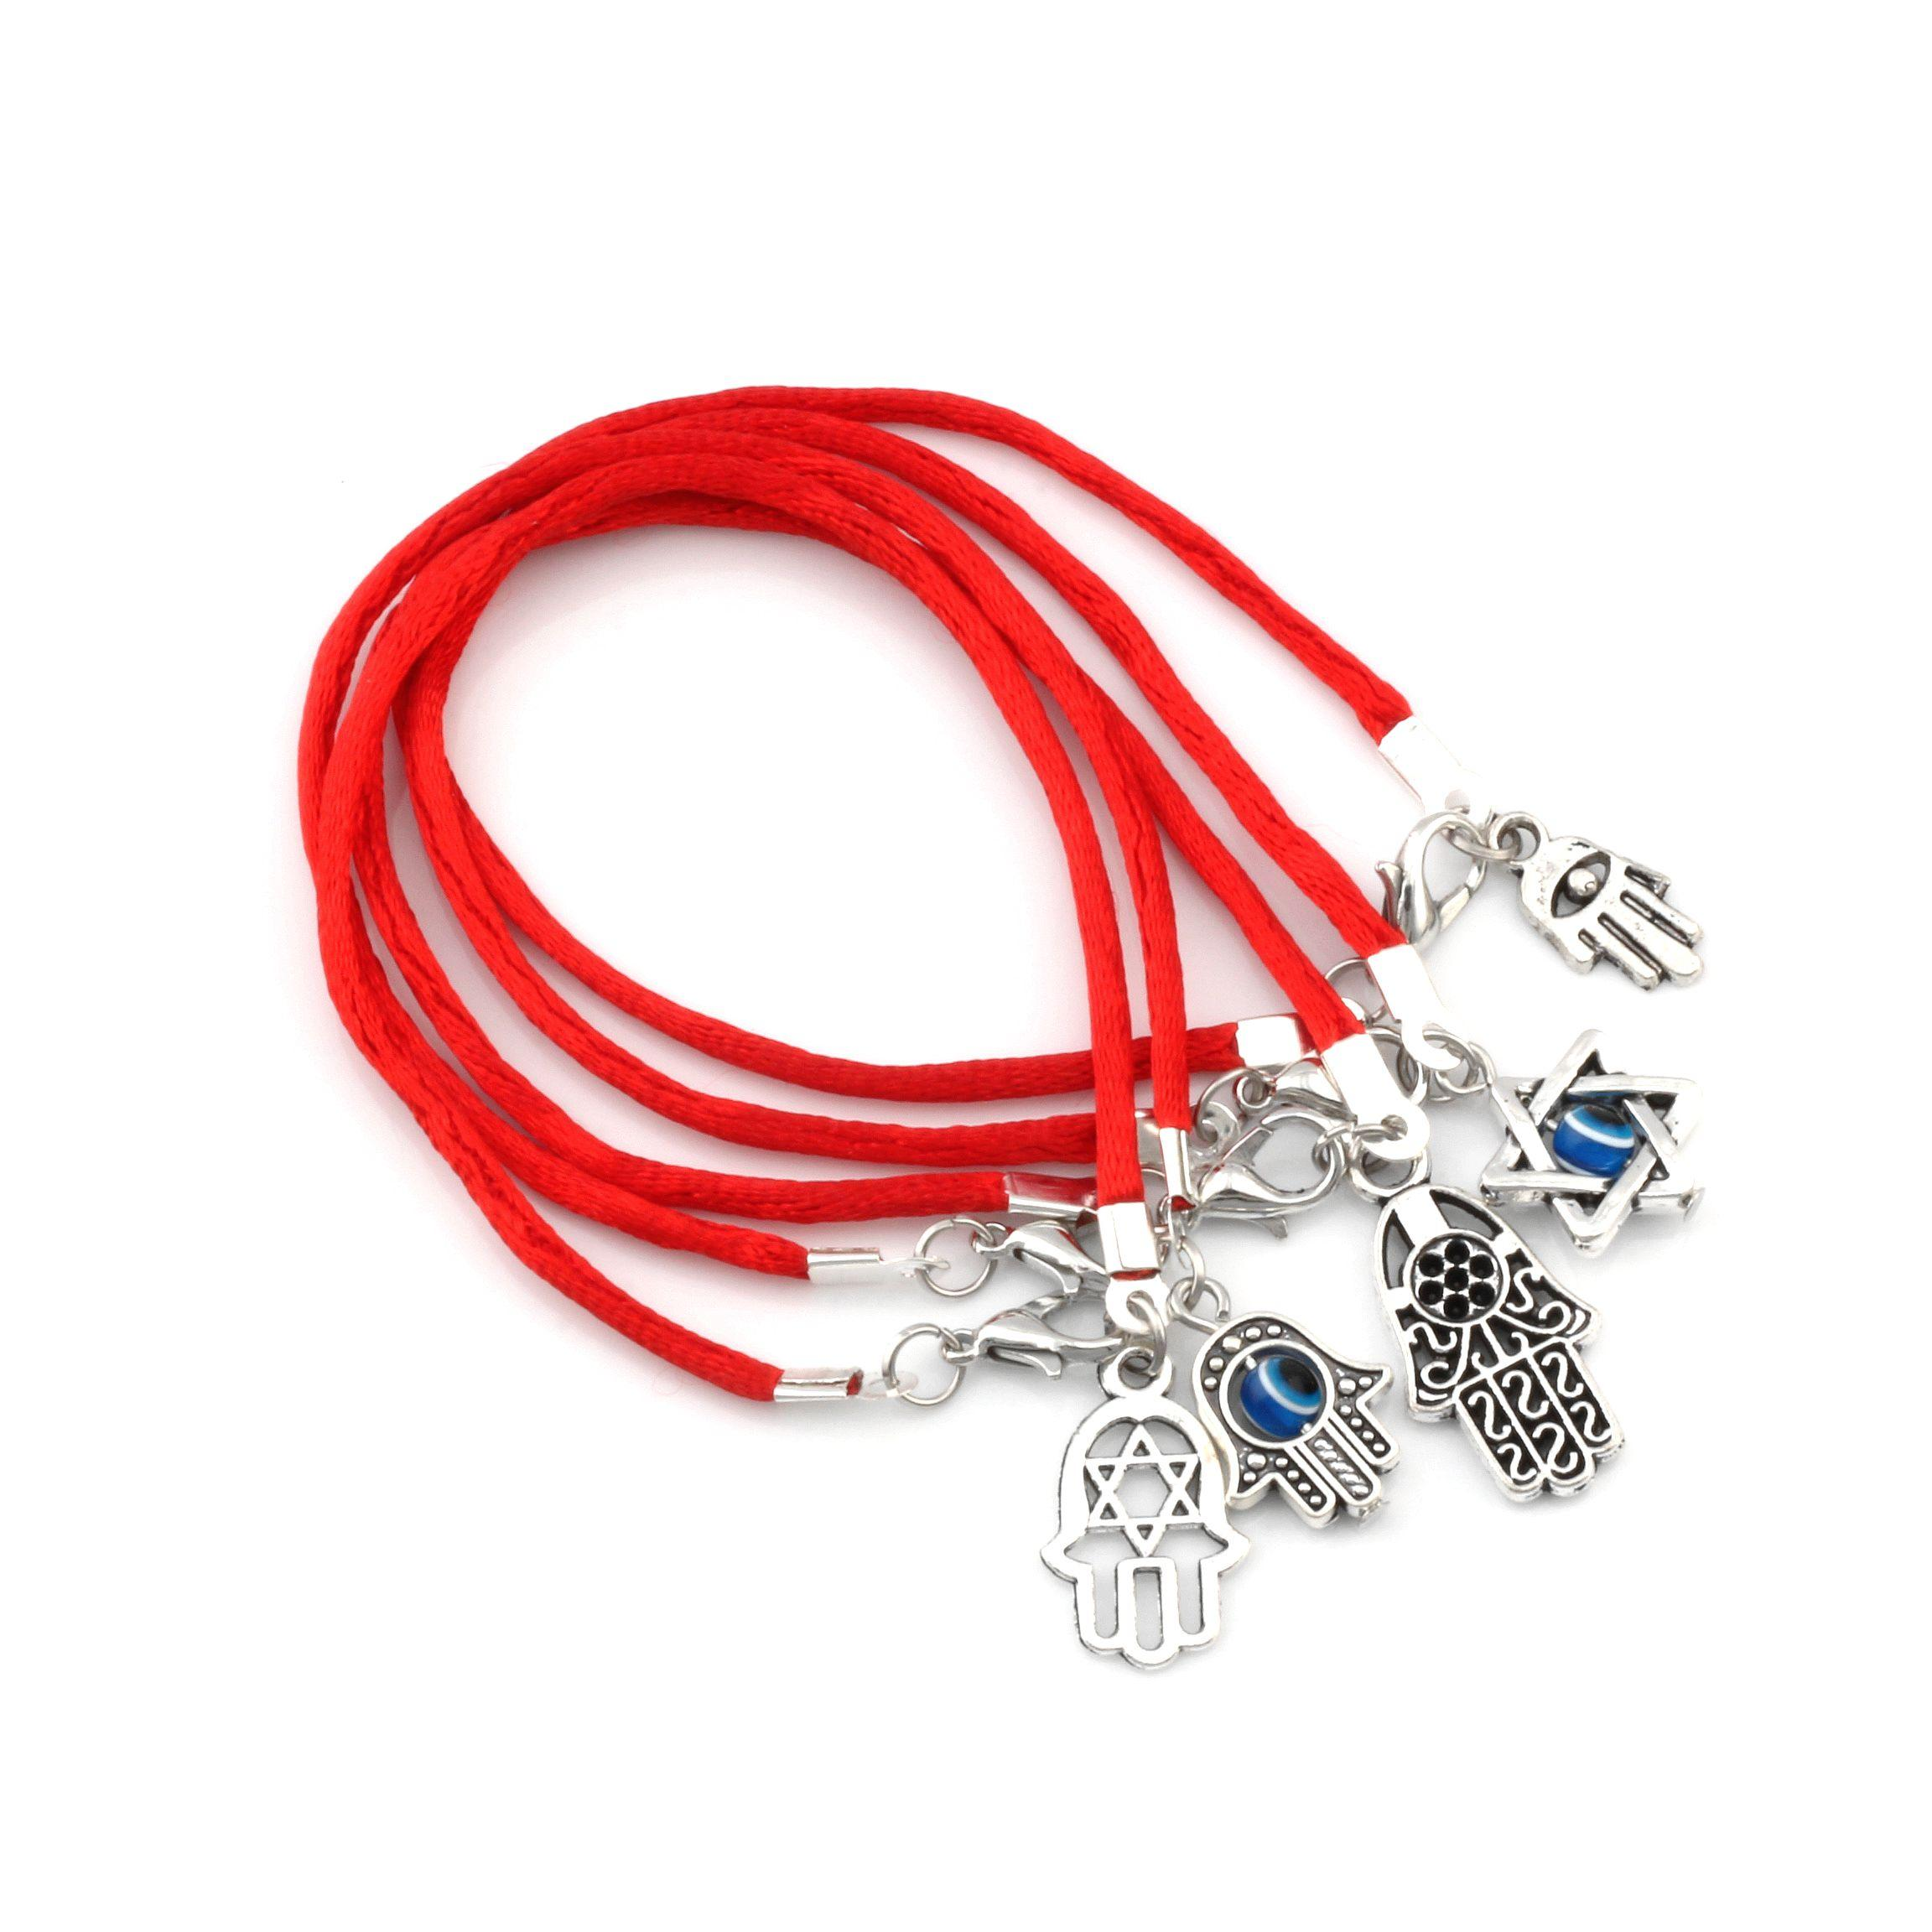 Hot Items 100Pcs Mixed Kabbalah Hände, Anhänger Red String Good Luck Armbänder Männer und Frauen Glück Armband